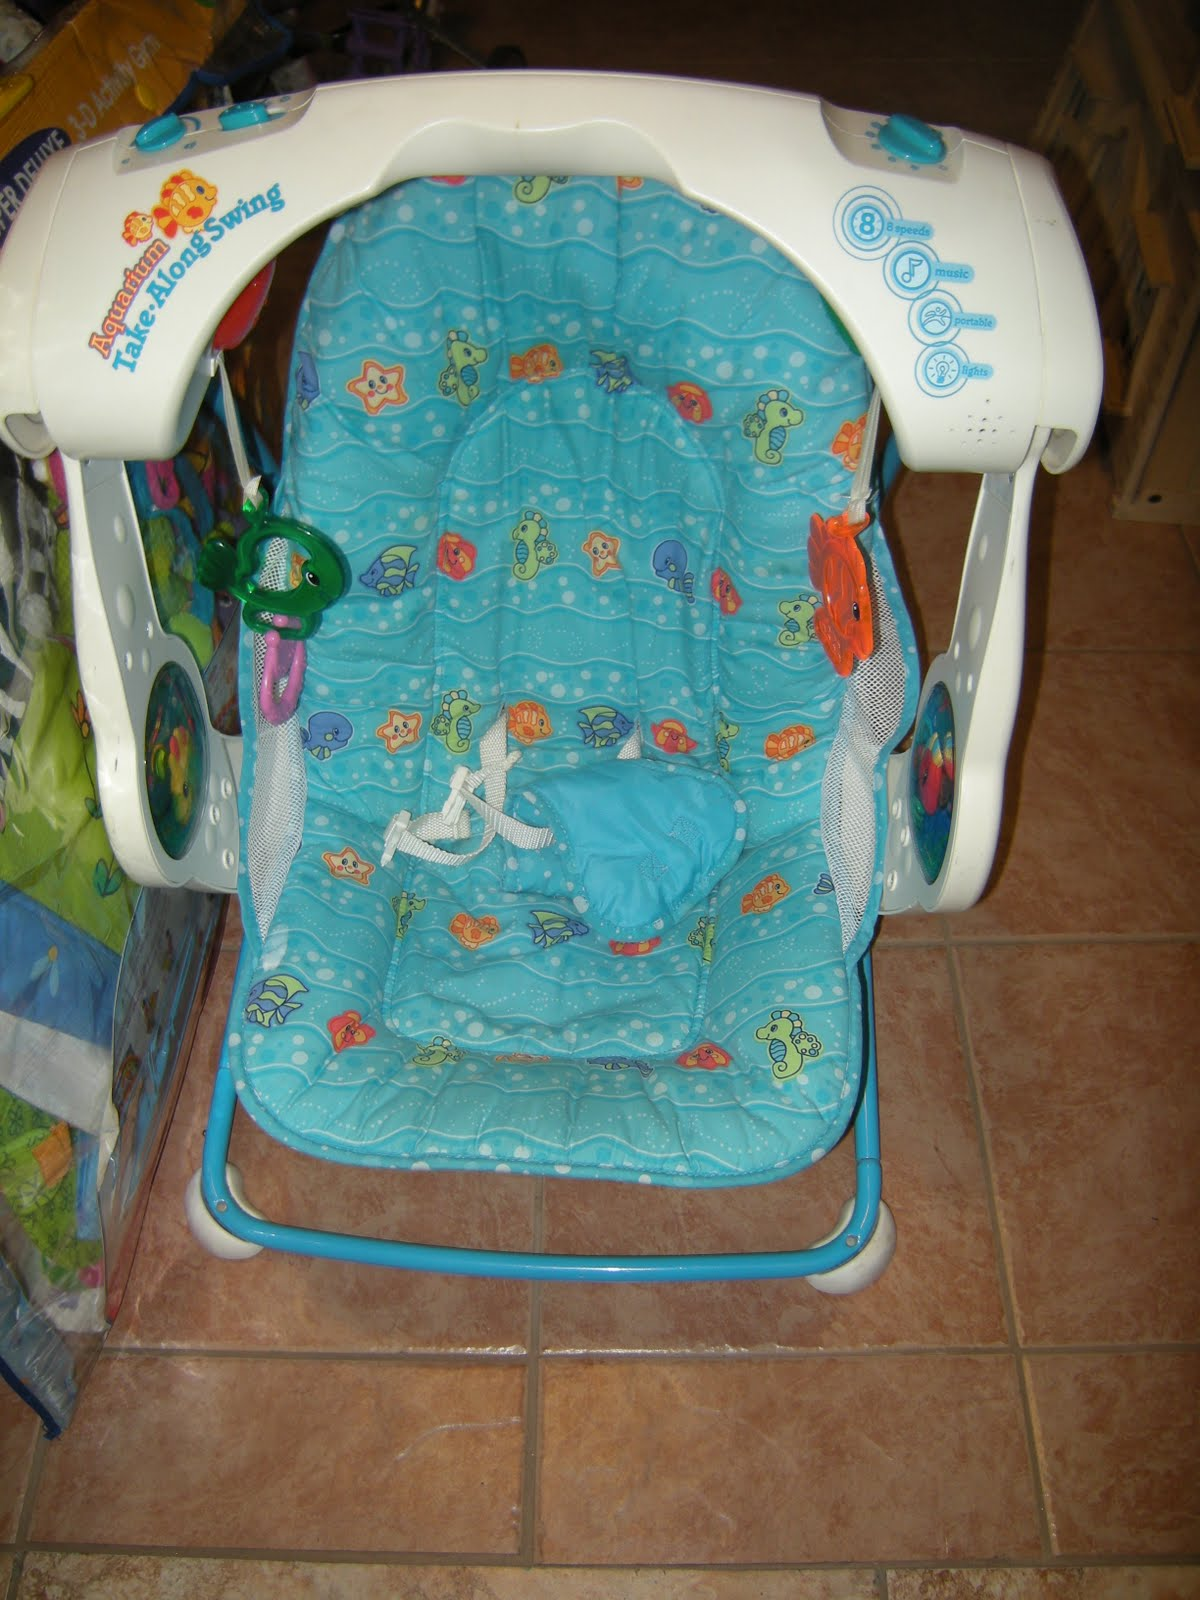 Eddie Bauer High Chair Rent A Marin Kids Consignment: Saturday, Flatter Day!